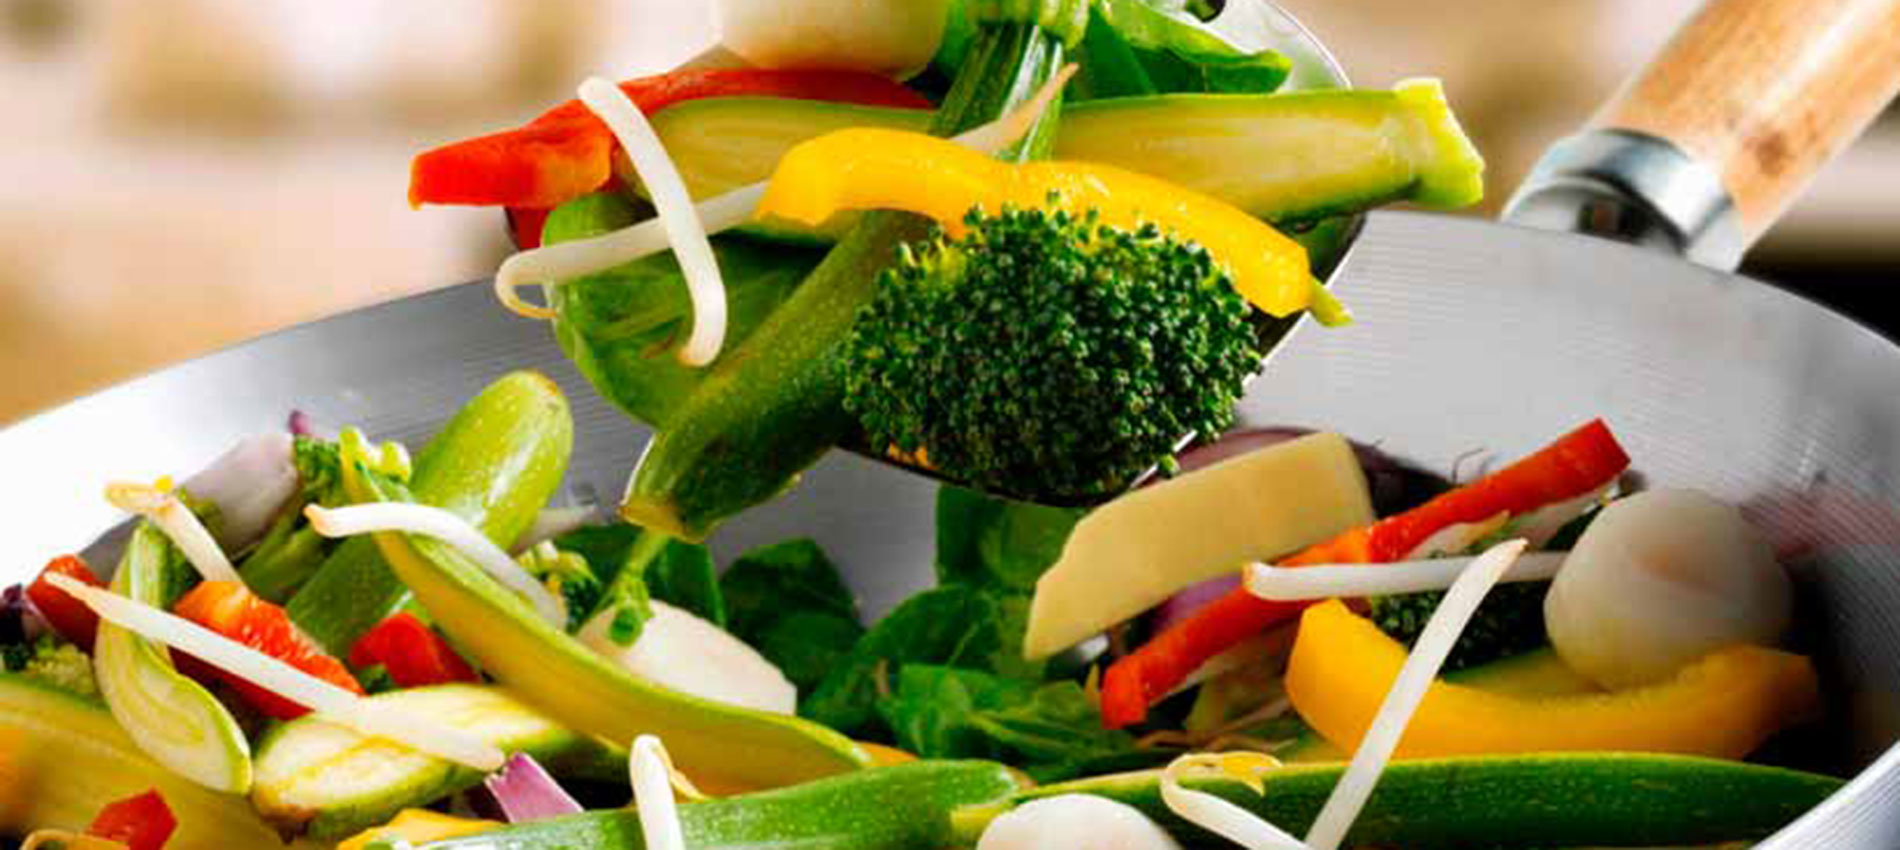 dieta vegetariana gilardi sara nutrizionista